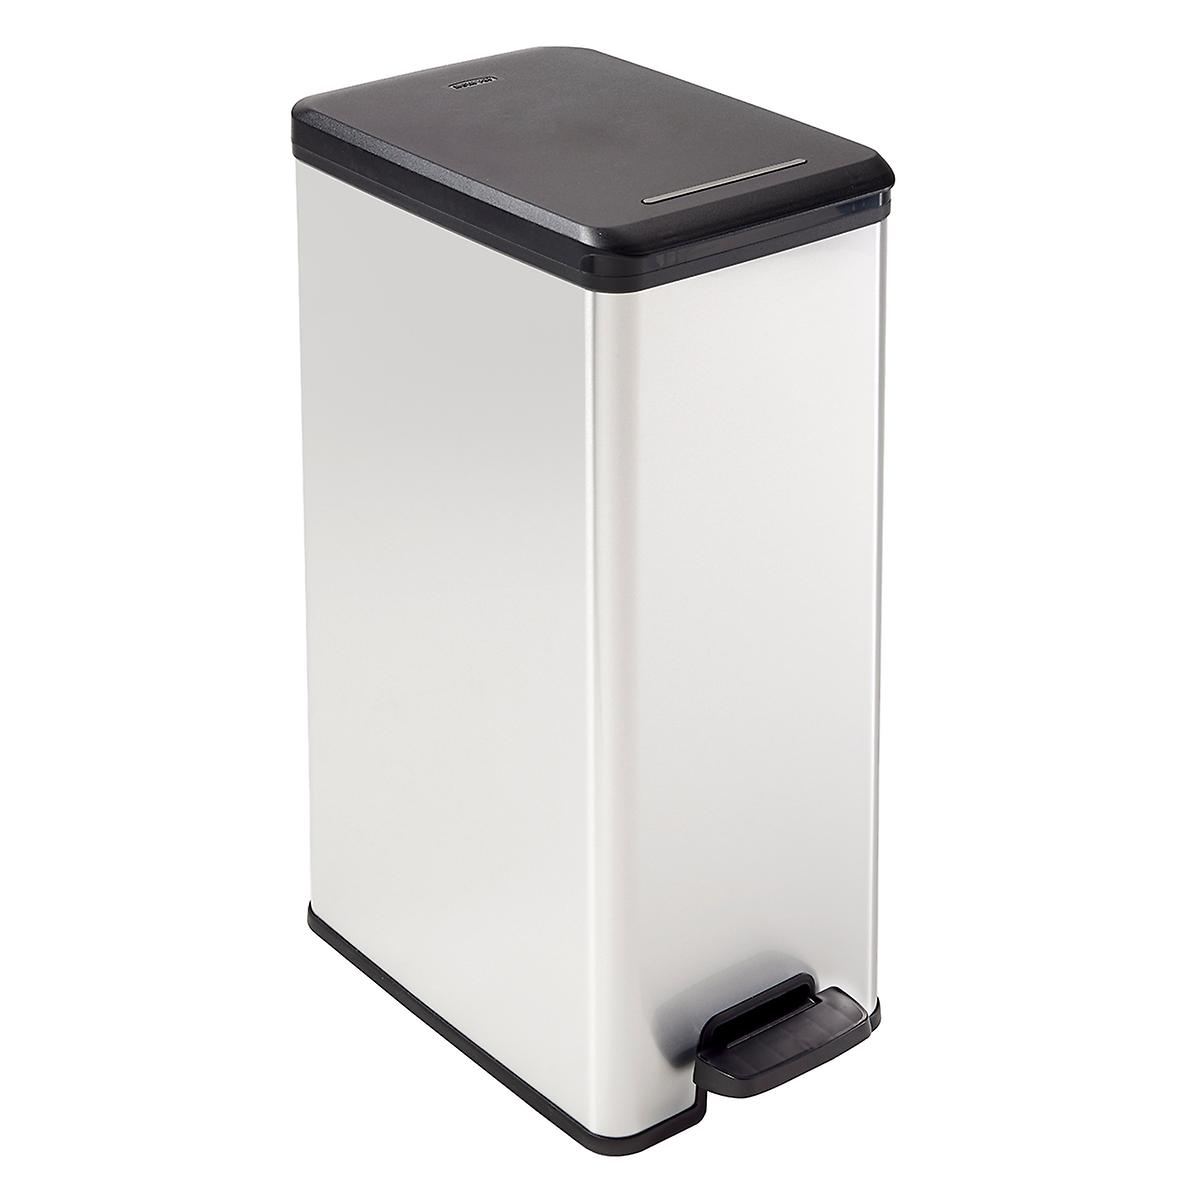 10.5 gal. Deco Slim Step-Open Trash Can